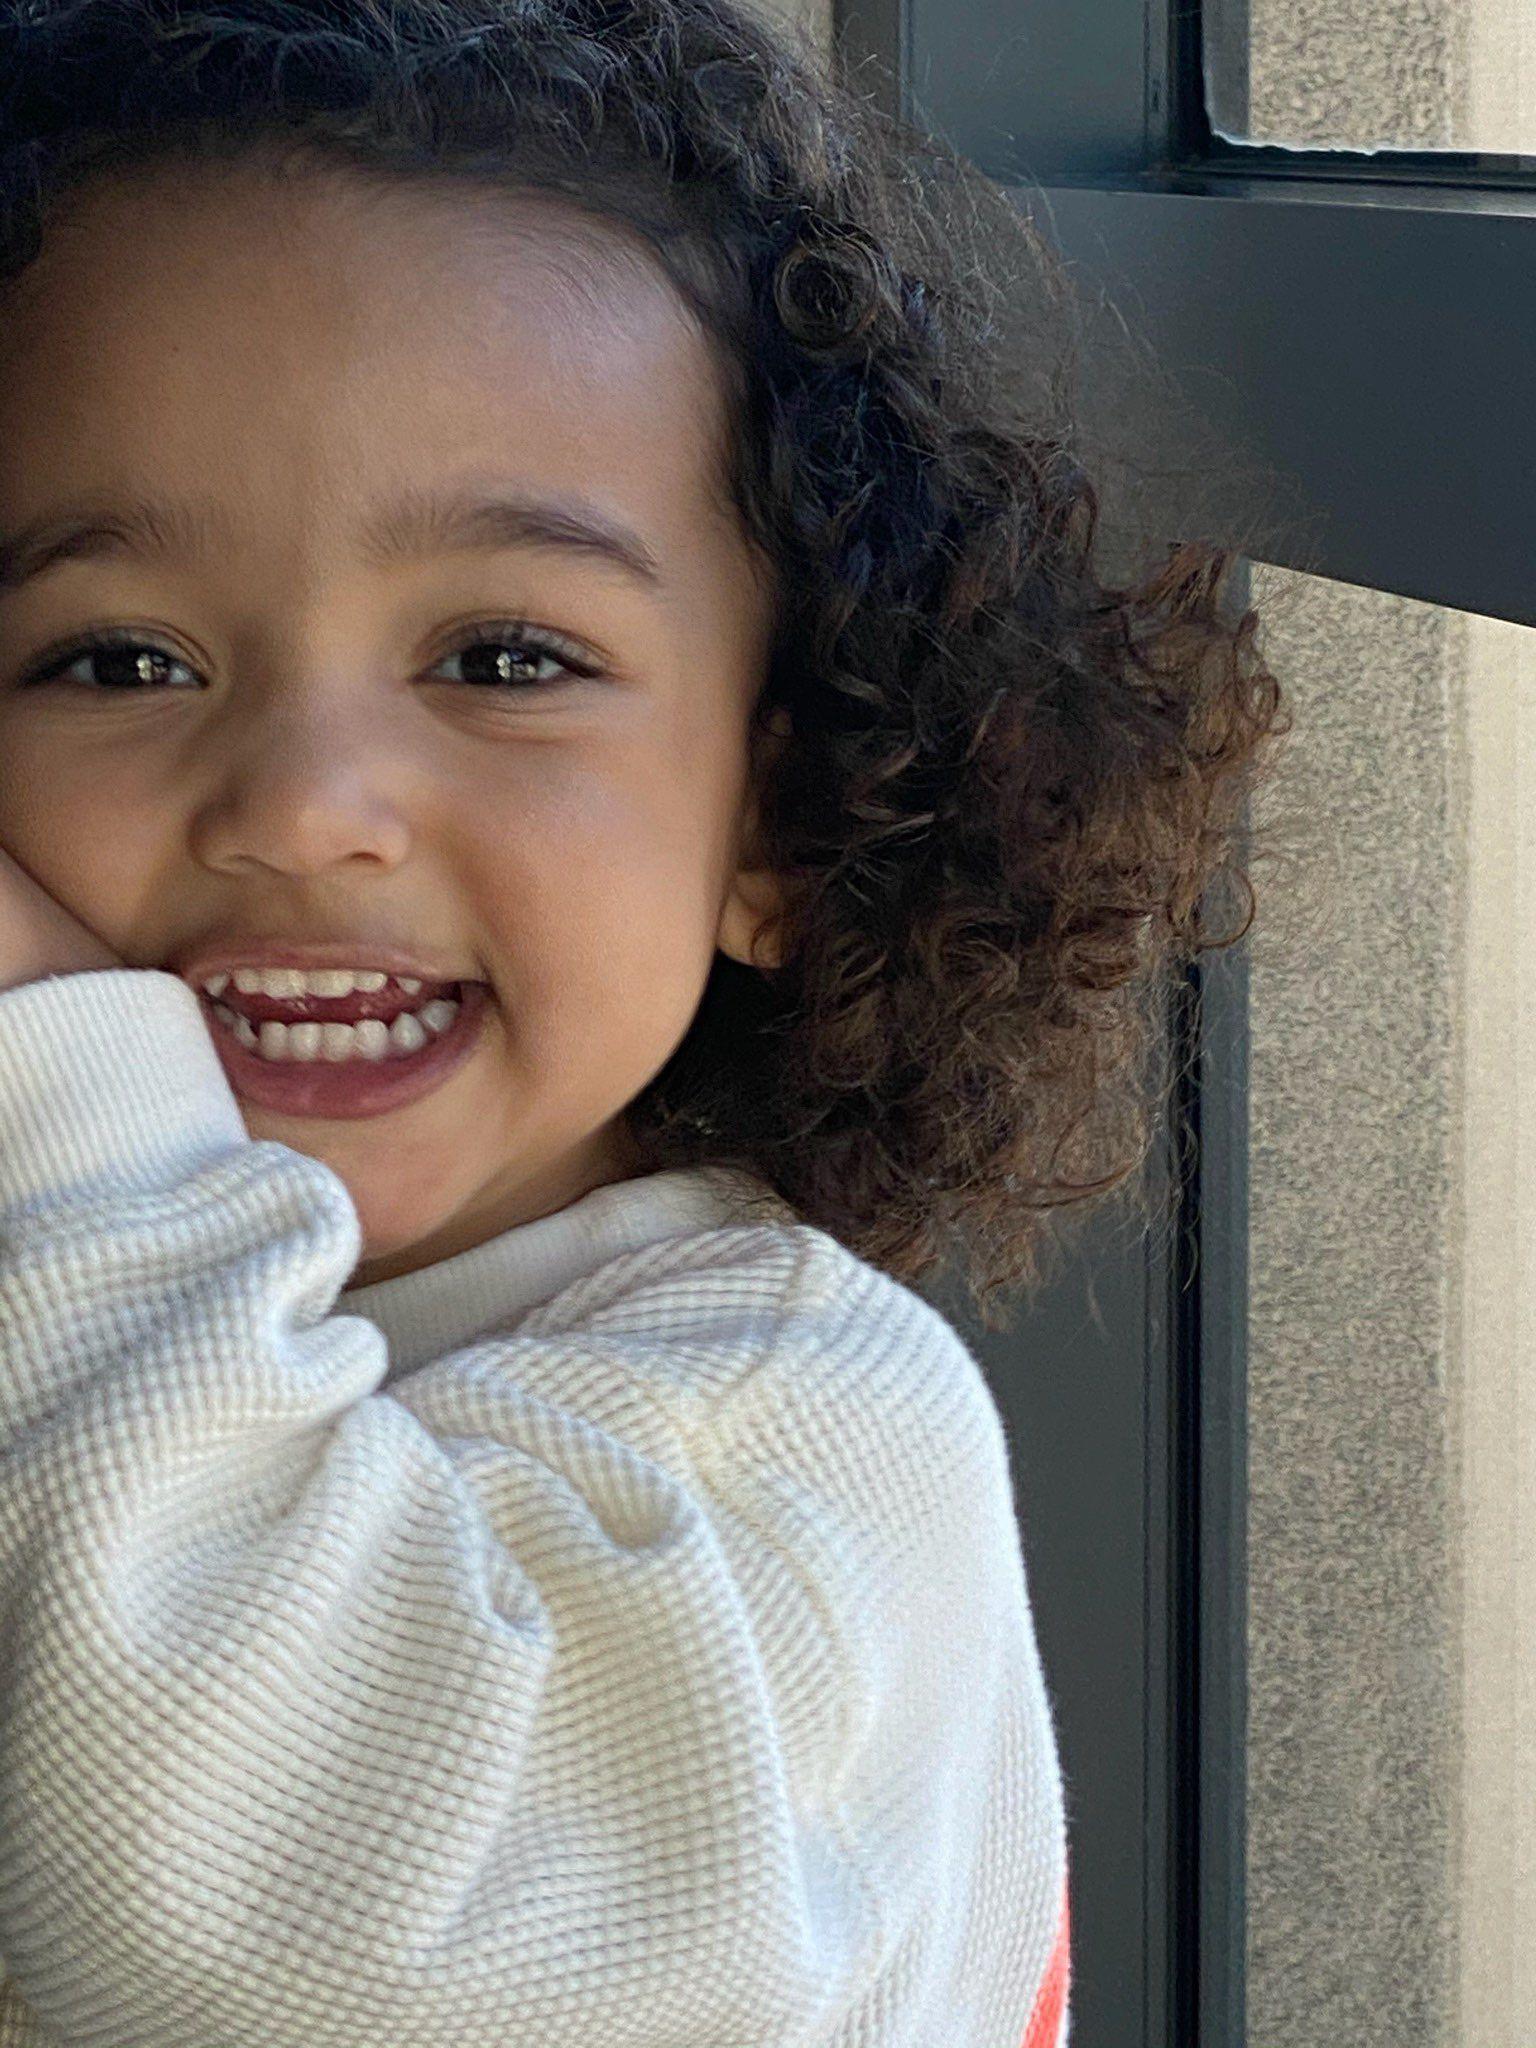 Pin By Ingrid Le On The West Family In 2020 Kardashian Kids Kardashian Celebrity Kids